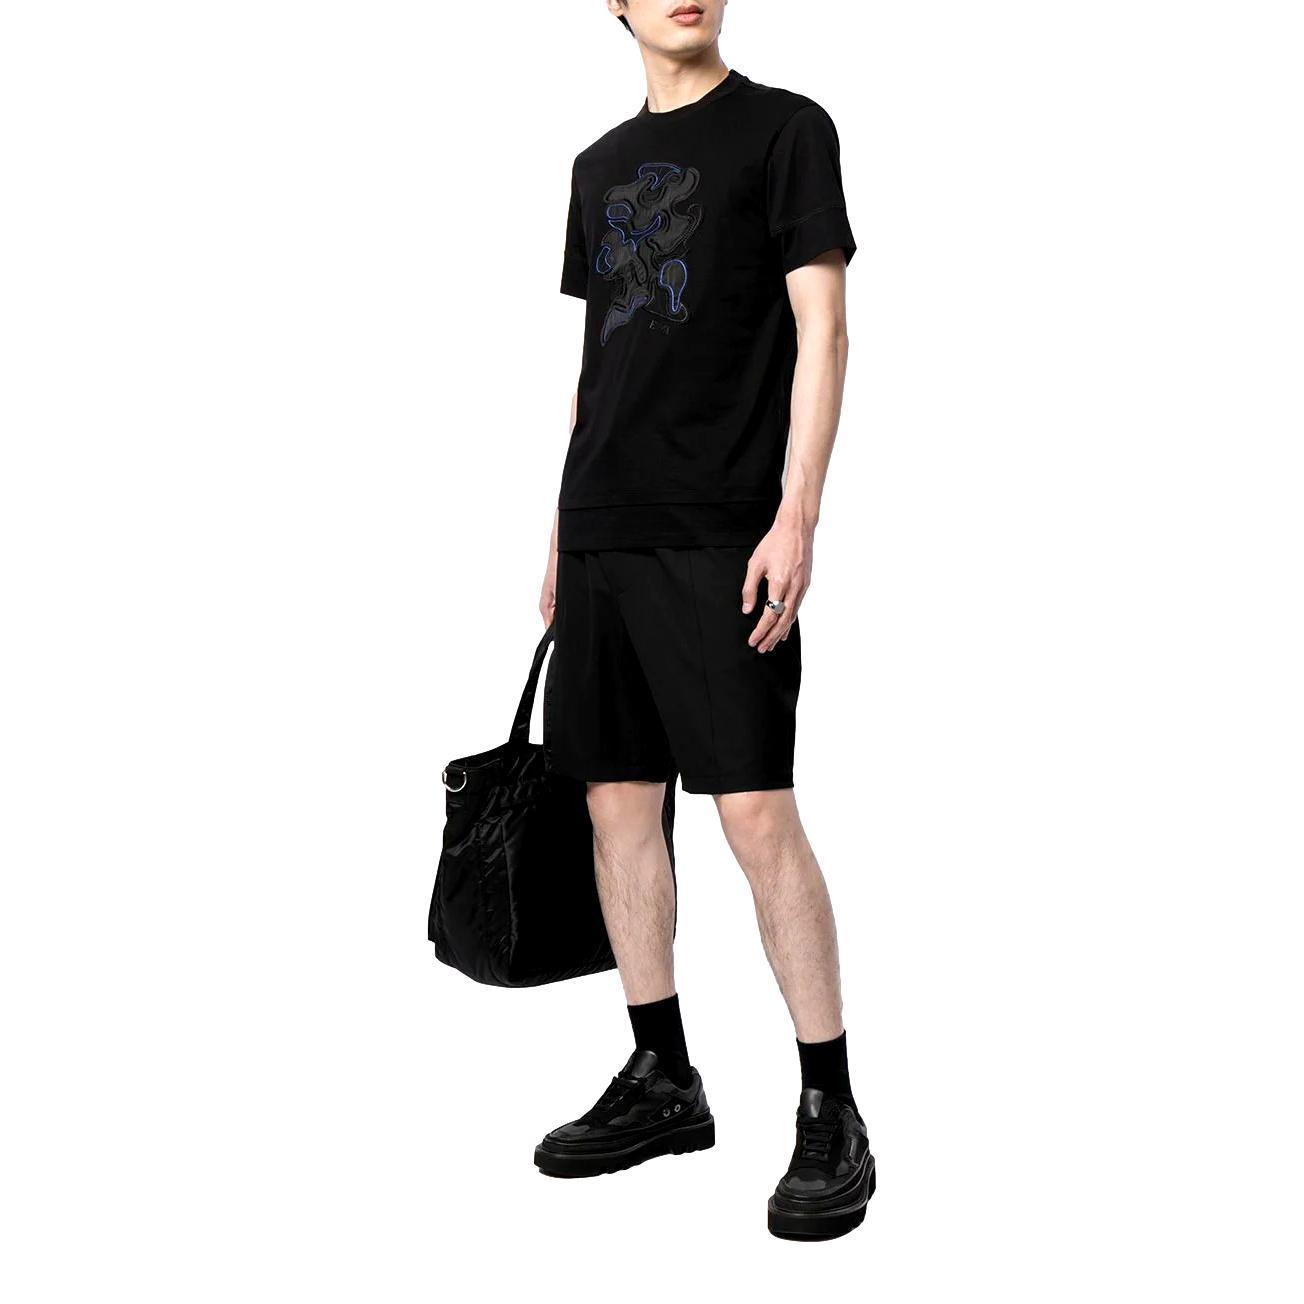 T-shirt con ricamo camouflage EMPORIO ARMANI |  | 3K1TM6 1JDXZ0999